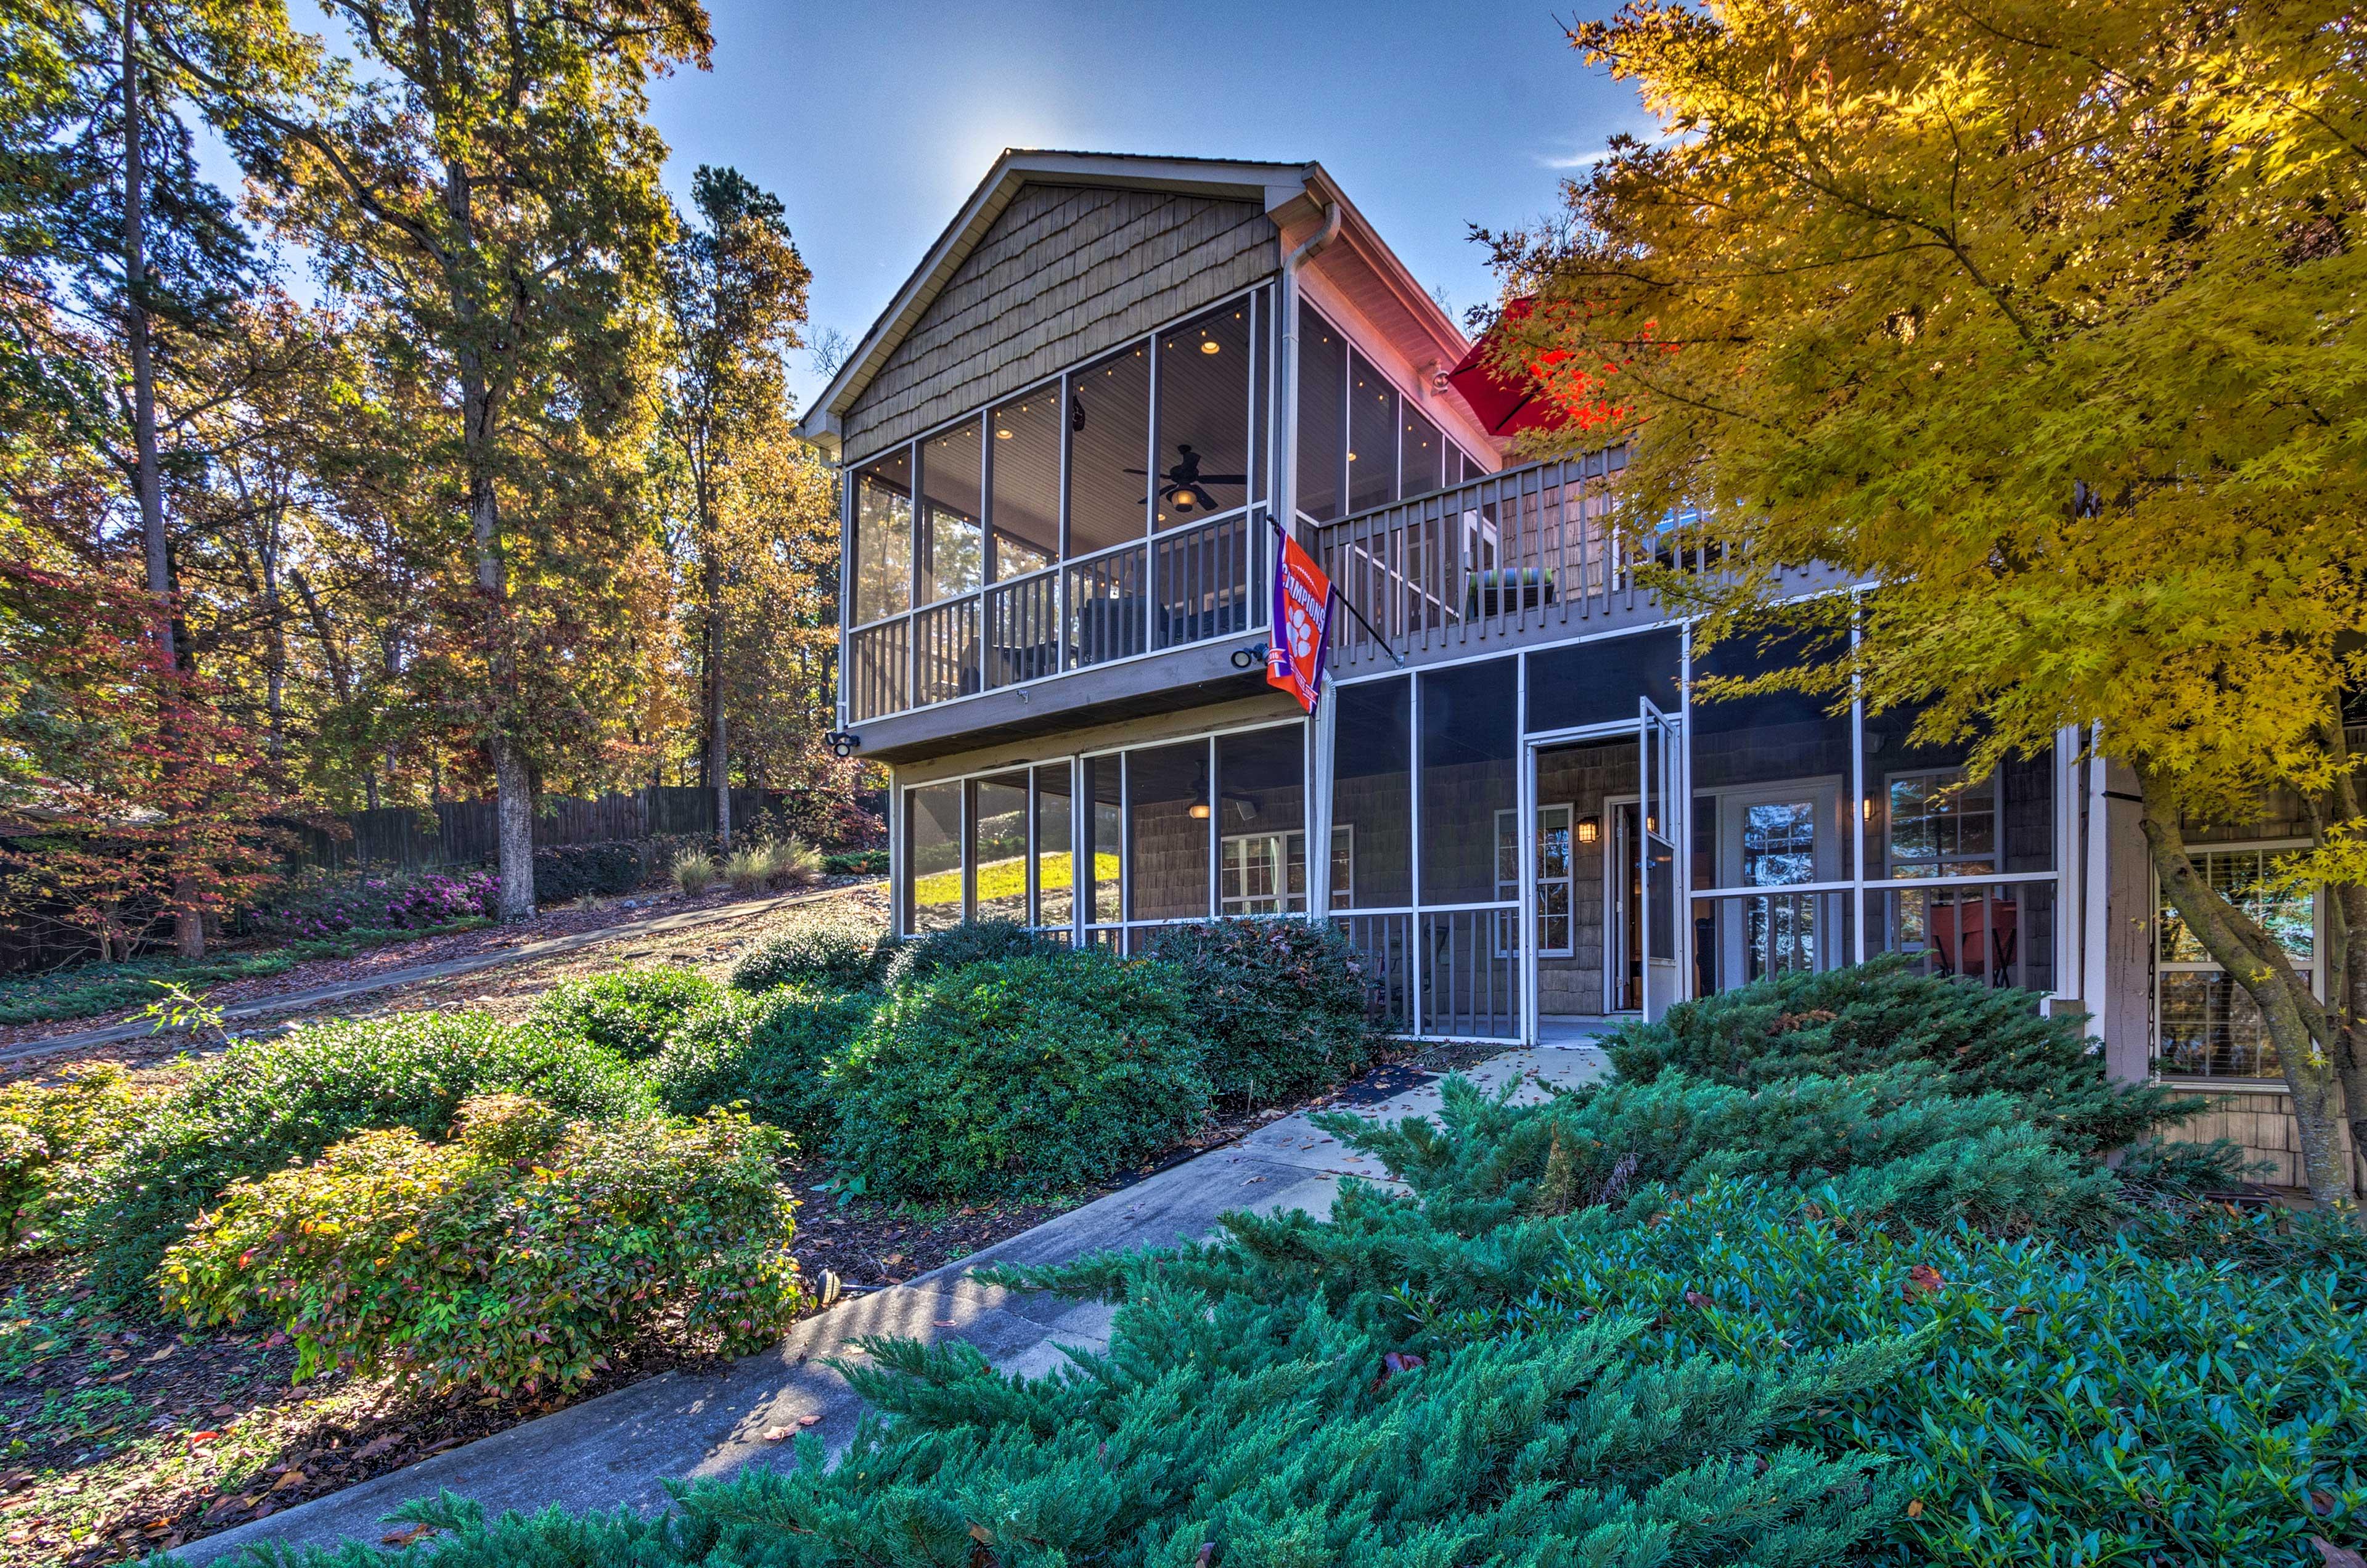 Seneca Vacation Rental Townhome | 3BR | 2.5BA | 1,150 Sq Ft